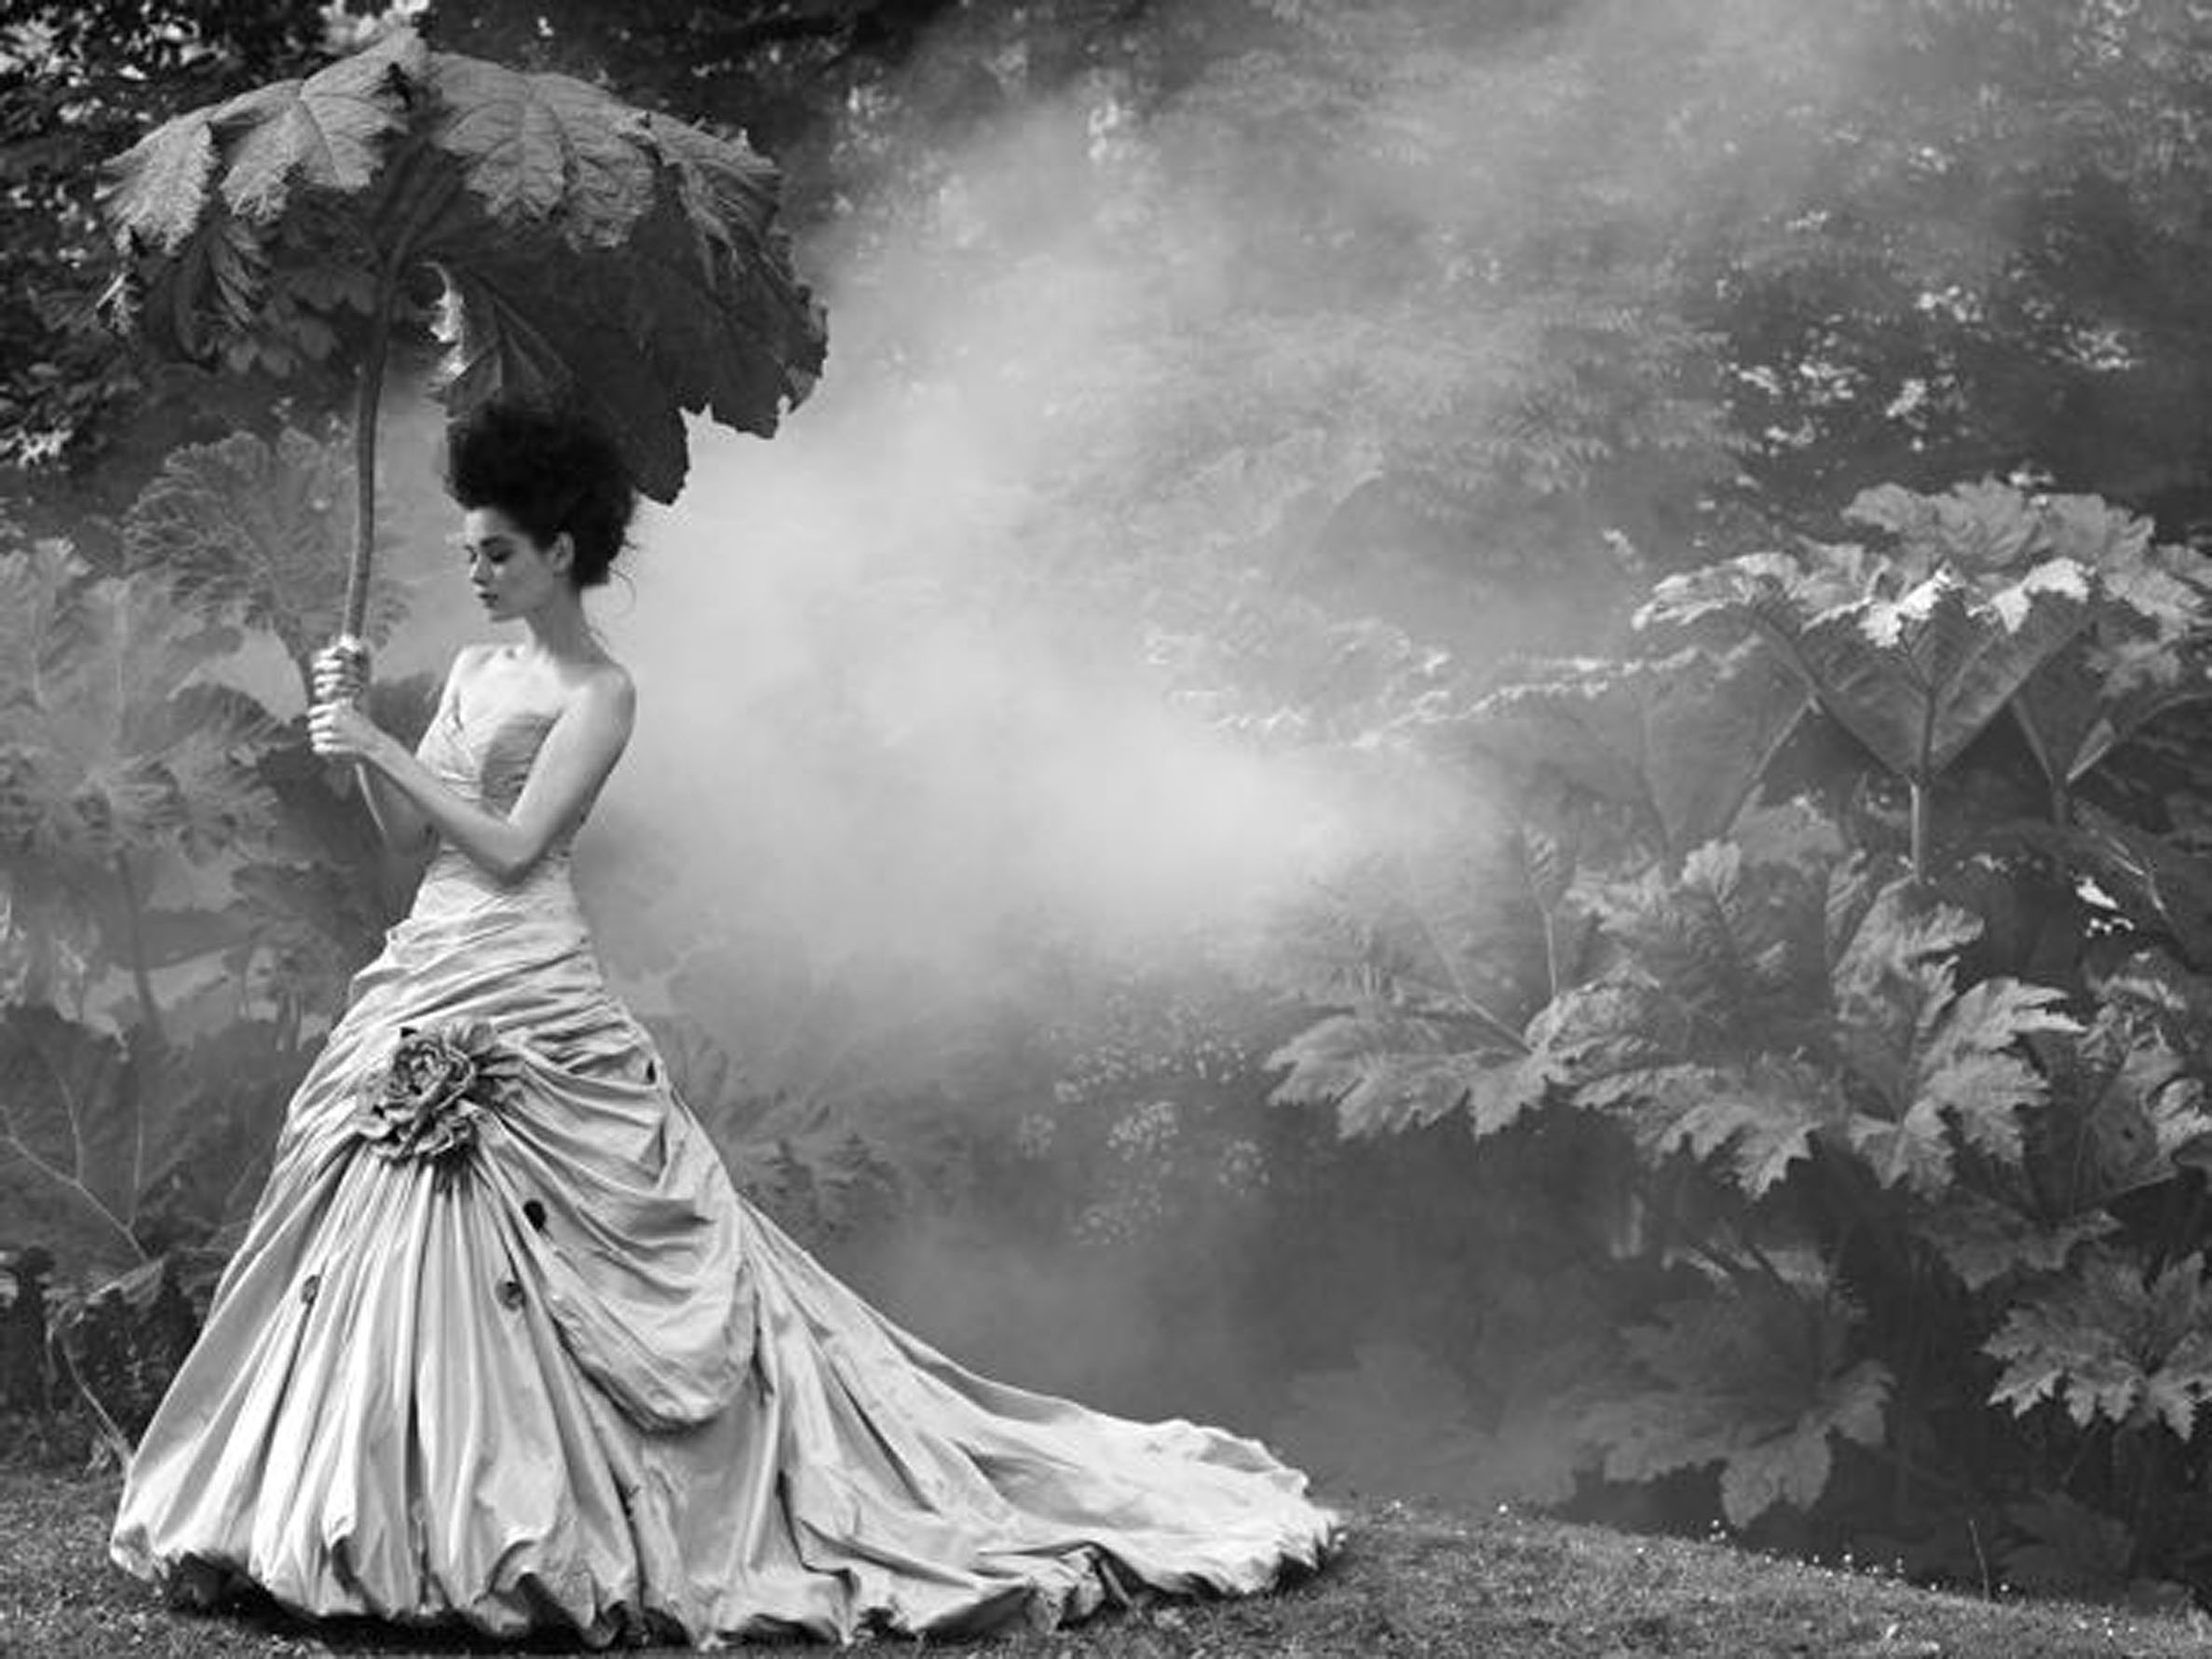 © Sheila Rock 'Garden Mist' 2012